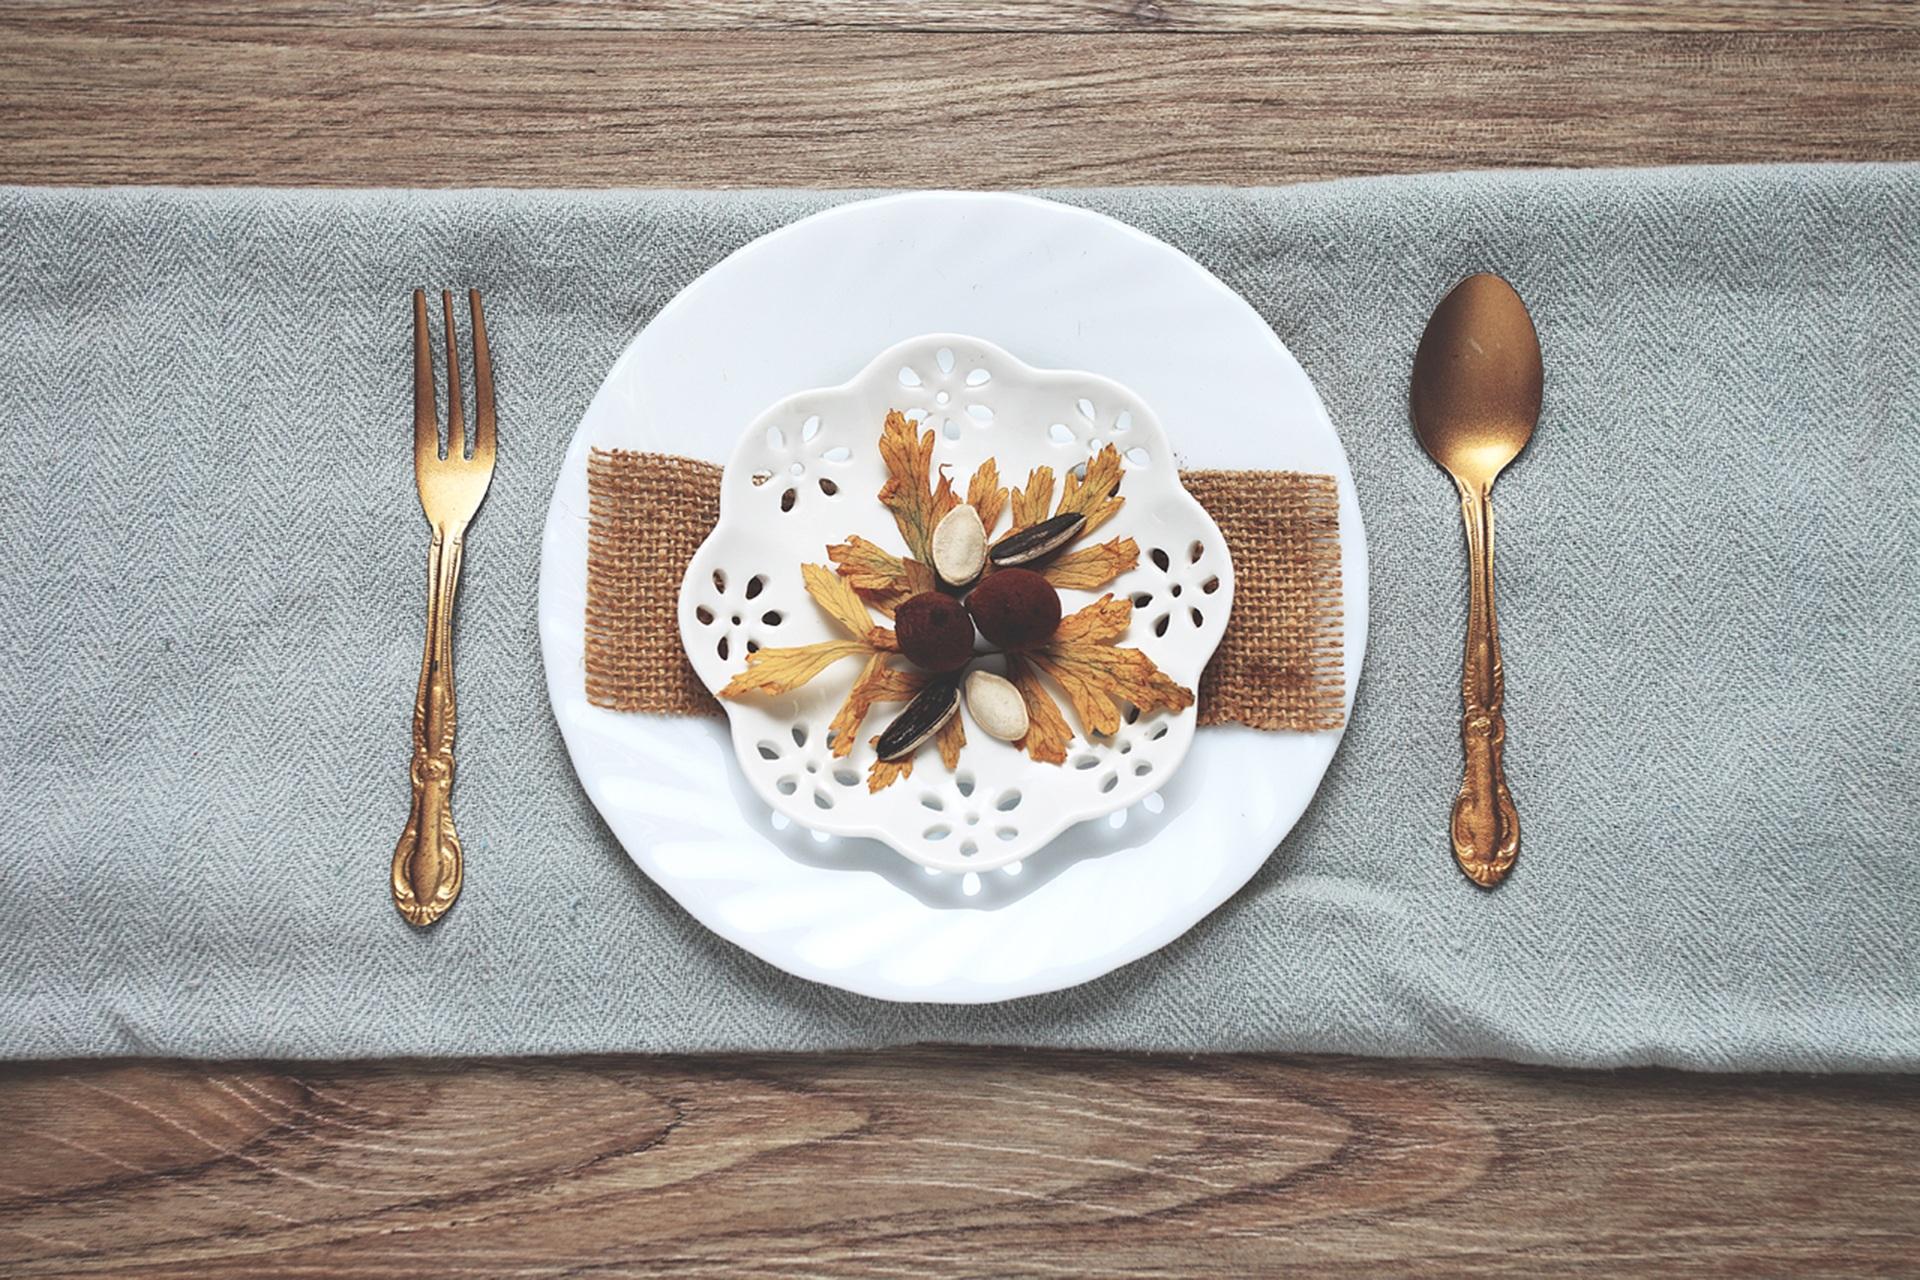 fork cutlery food plate breakfast dessert tableware spoon dining porcelain flavor dishware elegant dining & Free Images : fork cutlery food plate breakfast dessert ...